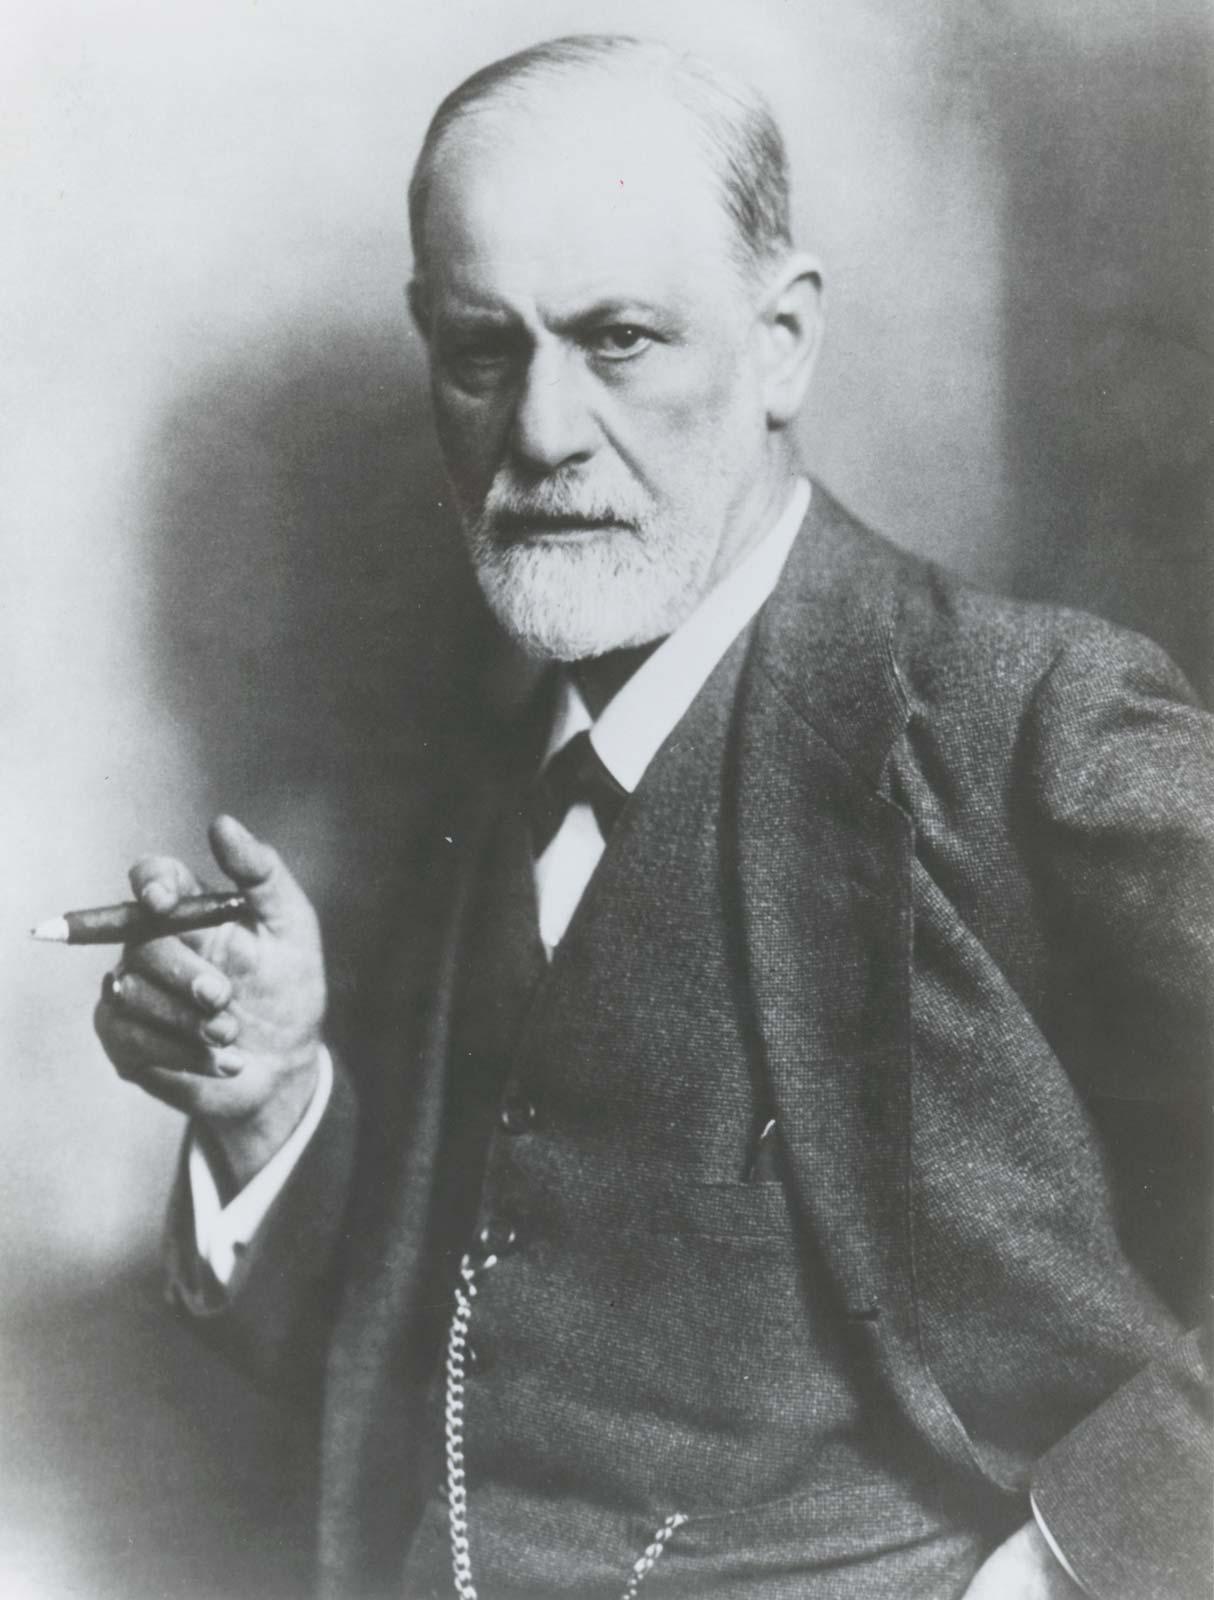 Sigmund Freud Biography Theories Psychoanalysis Books 1214x1600